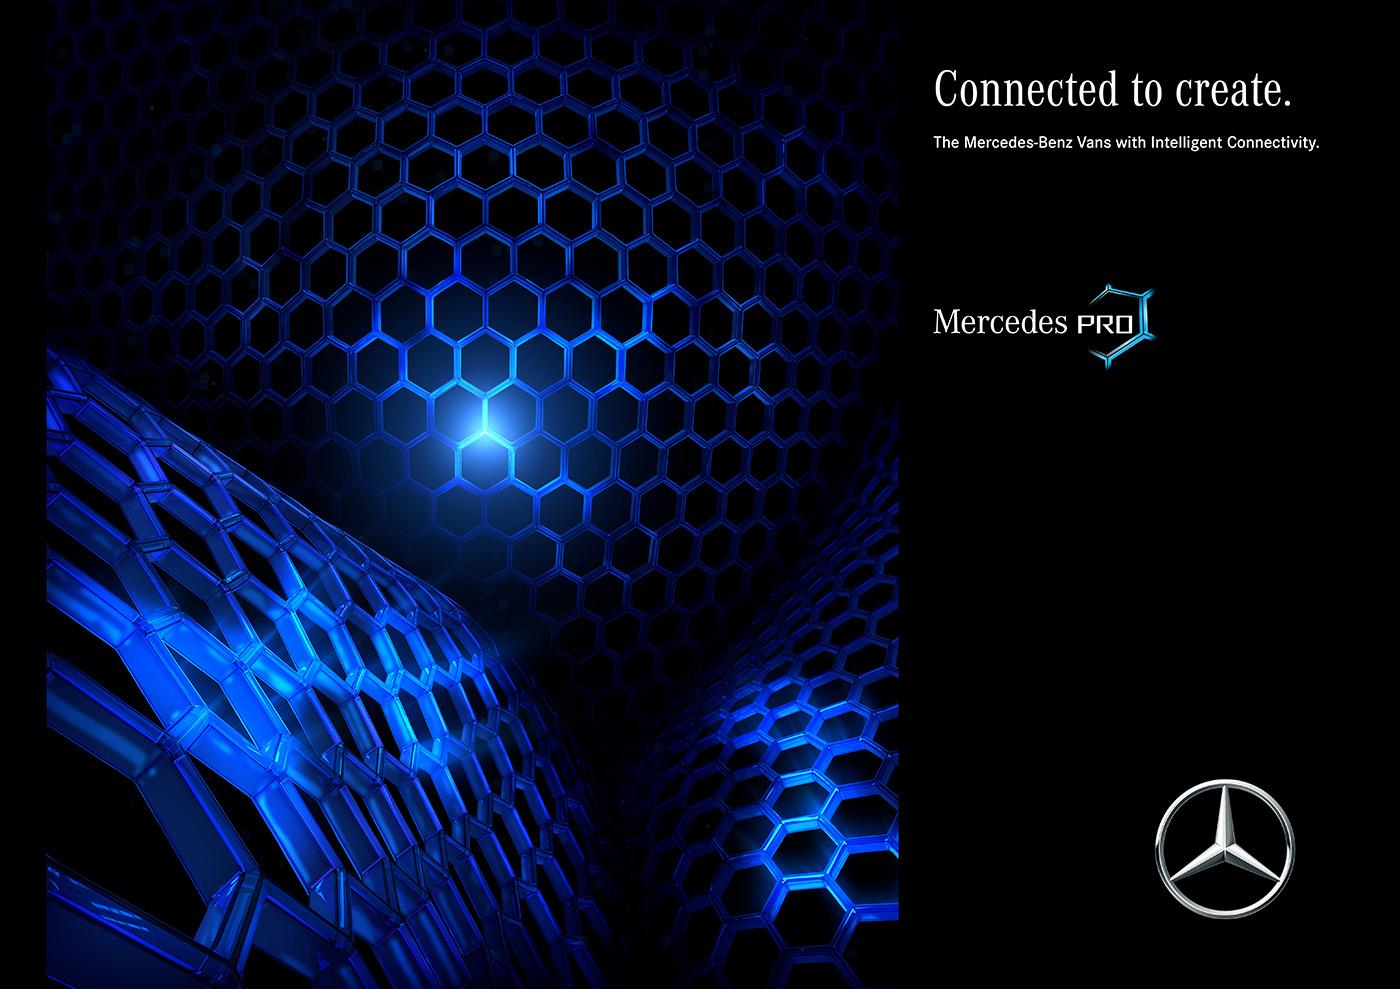 160914_Connectivity-Keyvisual-2-13